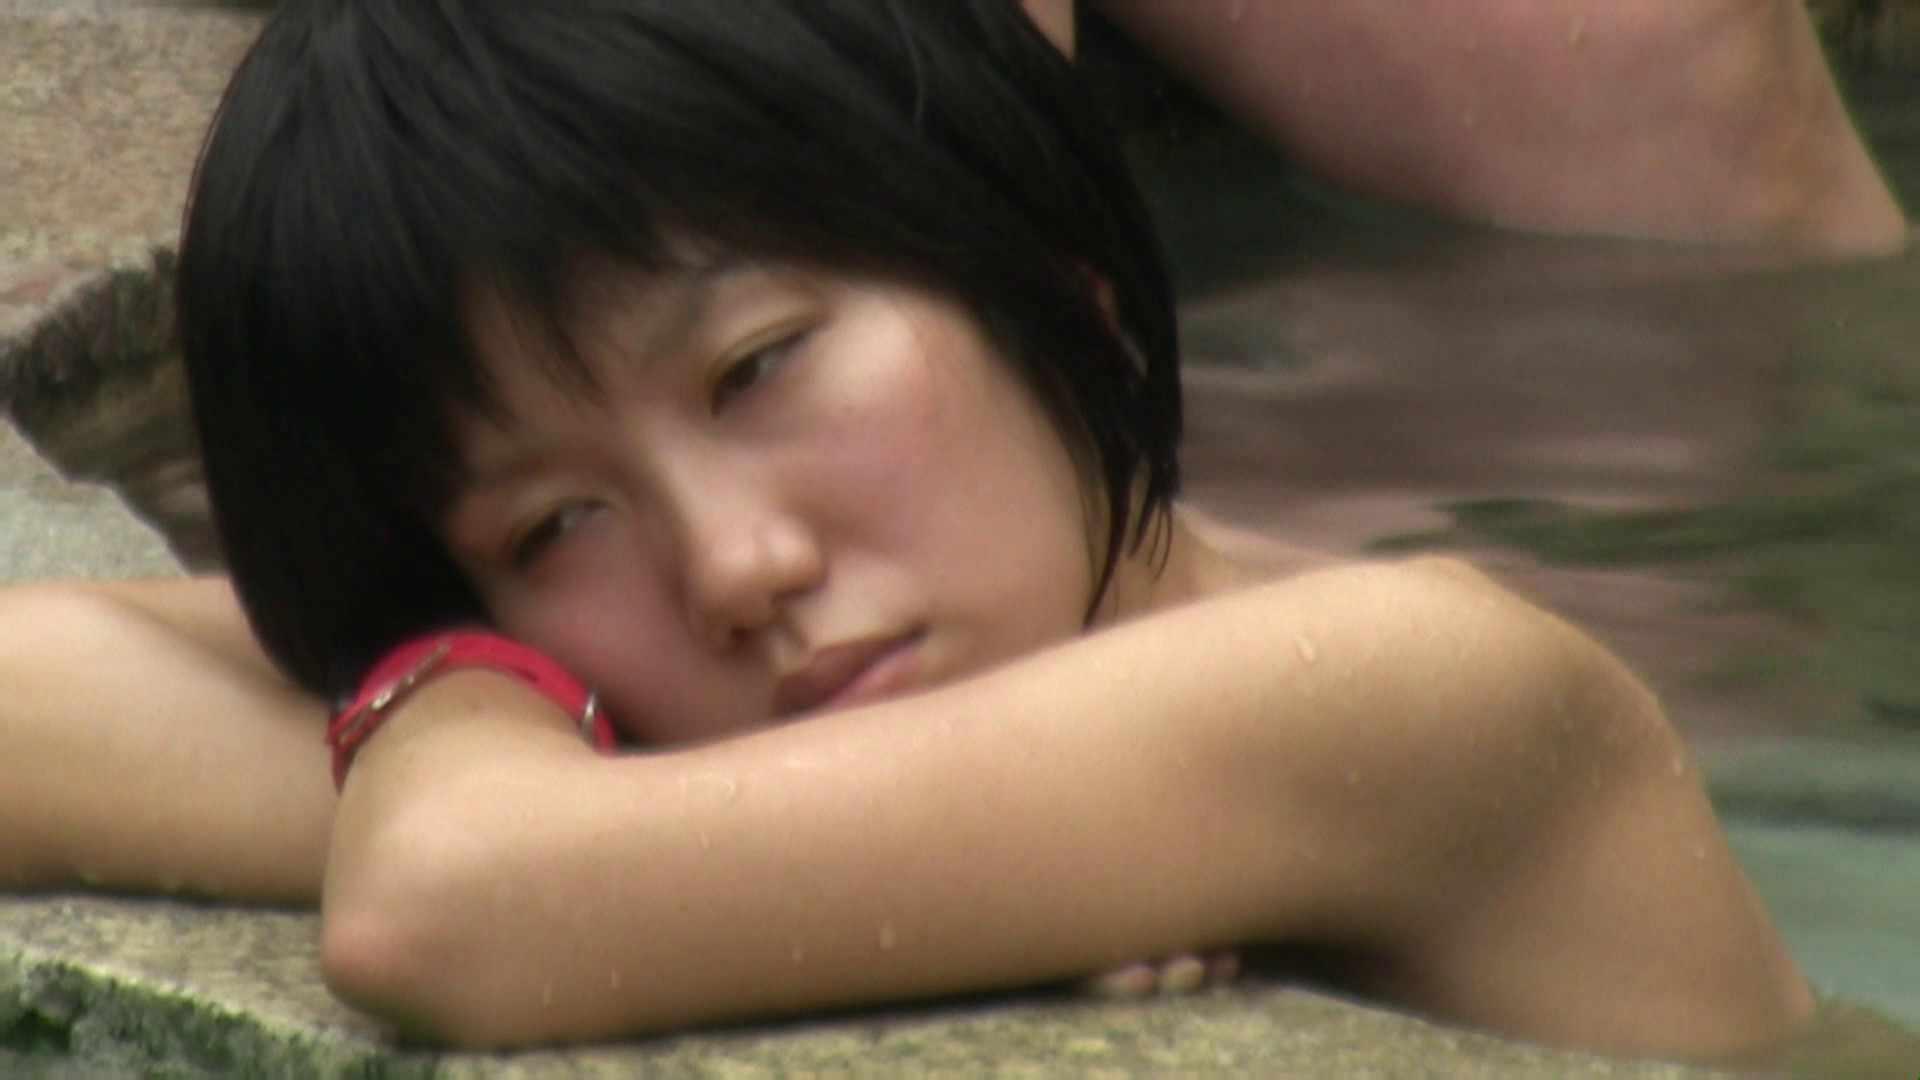 Aquaな露天風呂Vol.37【VIP】 盗撮 濡れ場動画紹介 97PICs 50